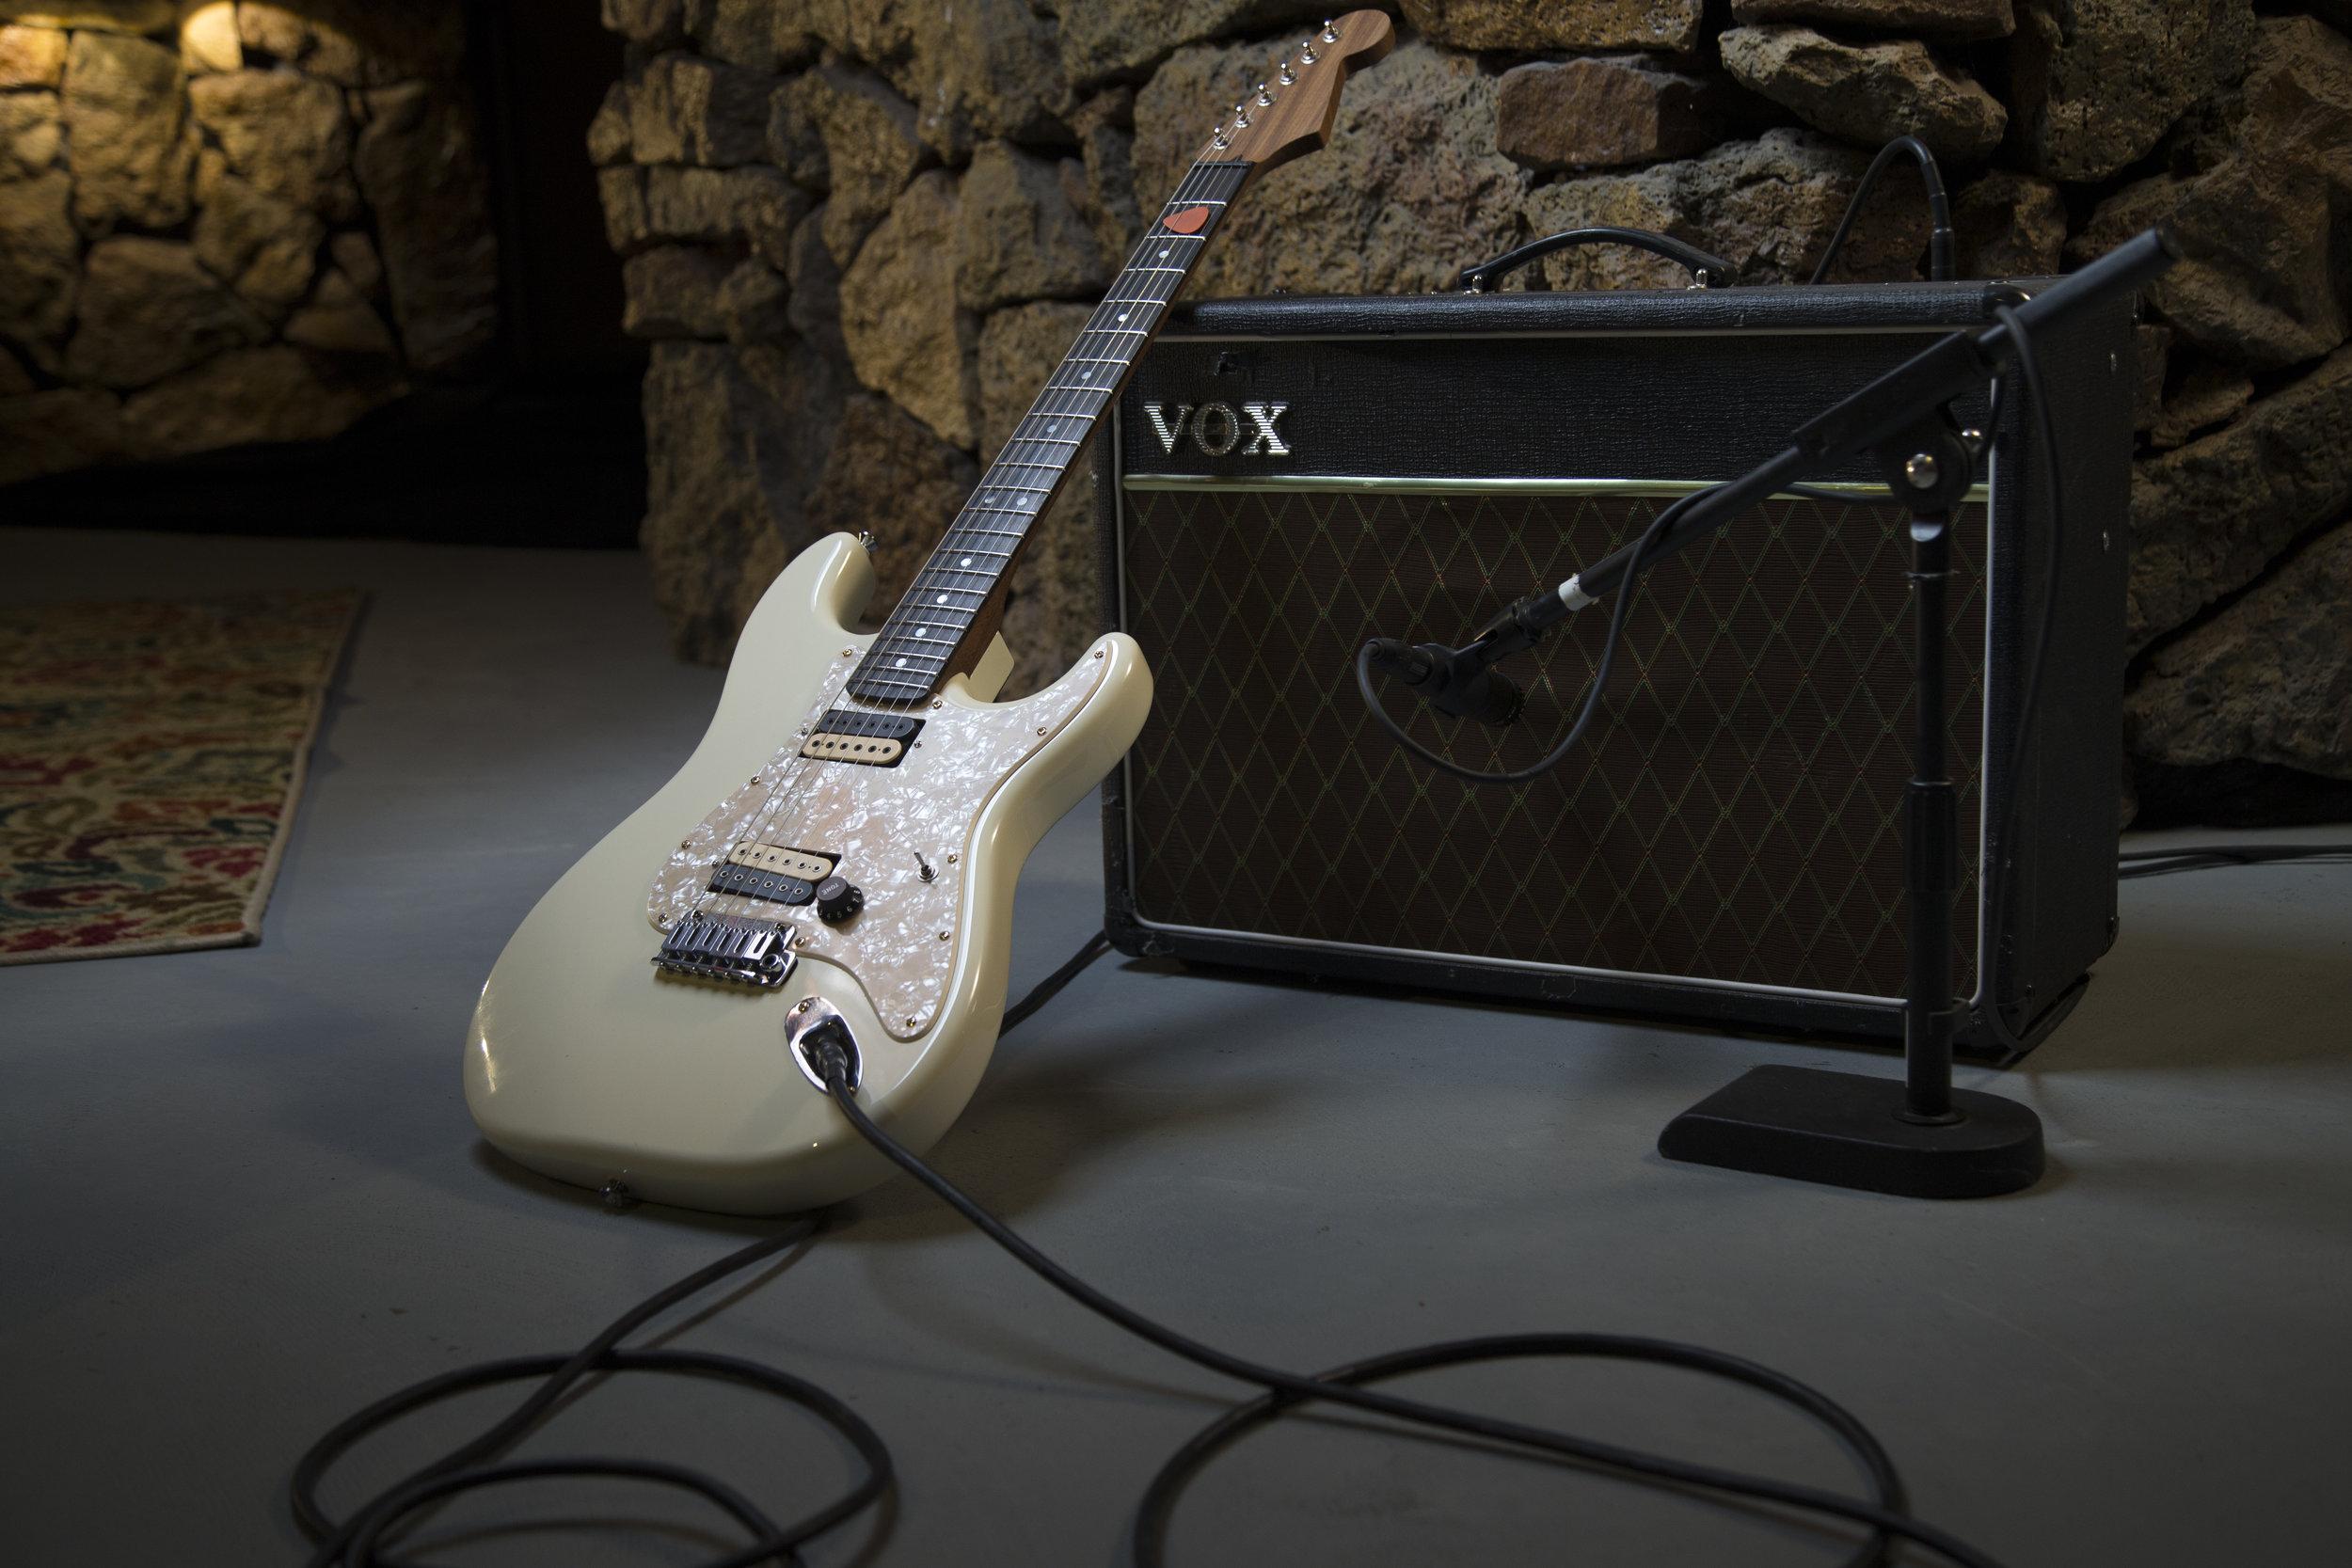 amp-guitar-wide.jpg